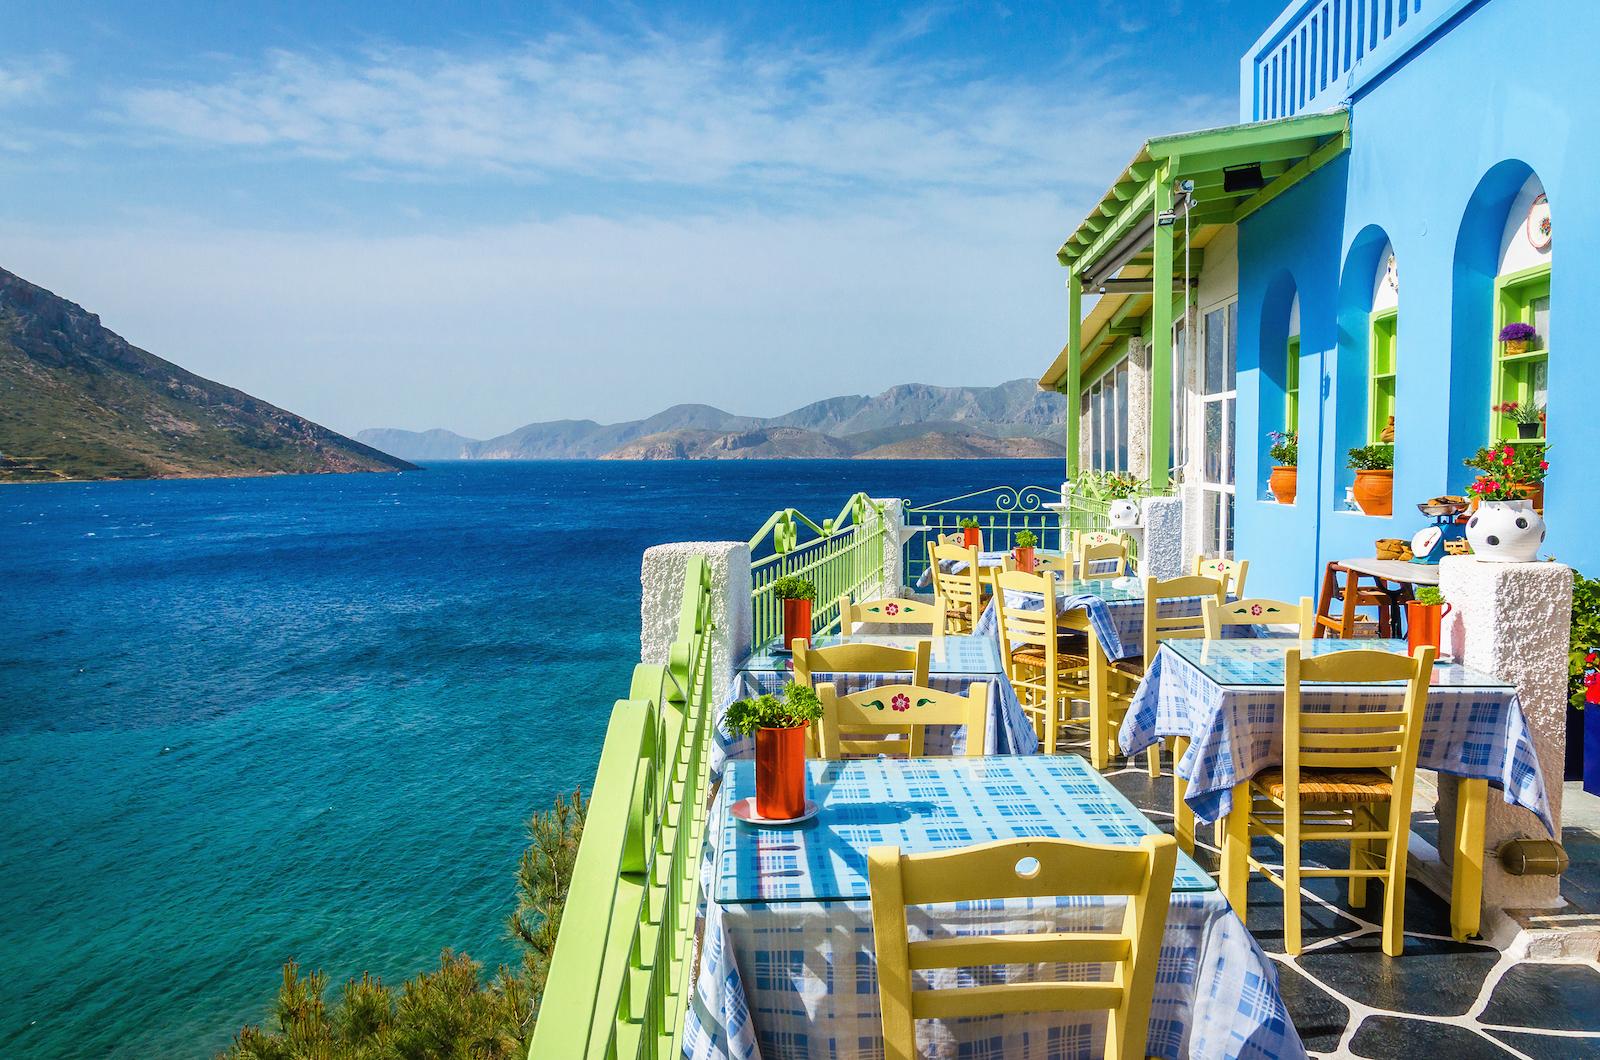 greek-restaurant-on-the-balcony-of-a-blue-building.jpg